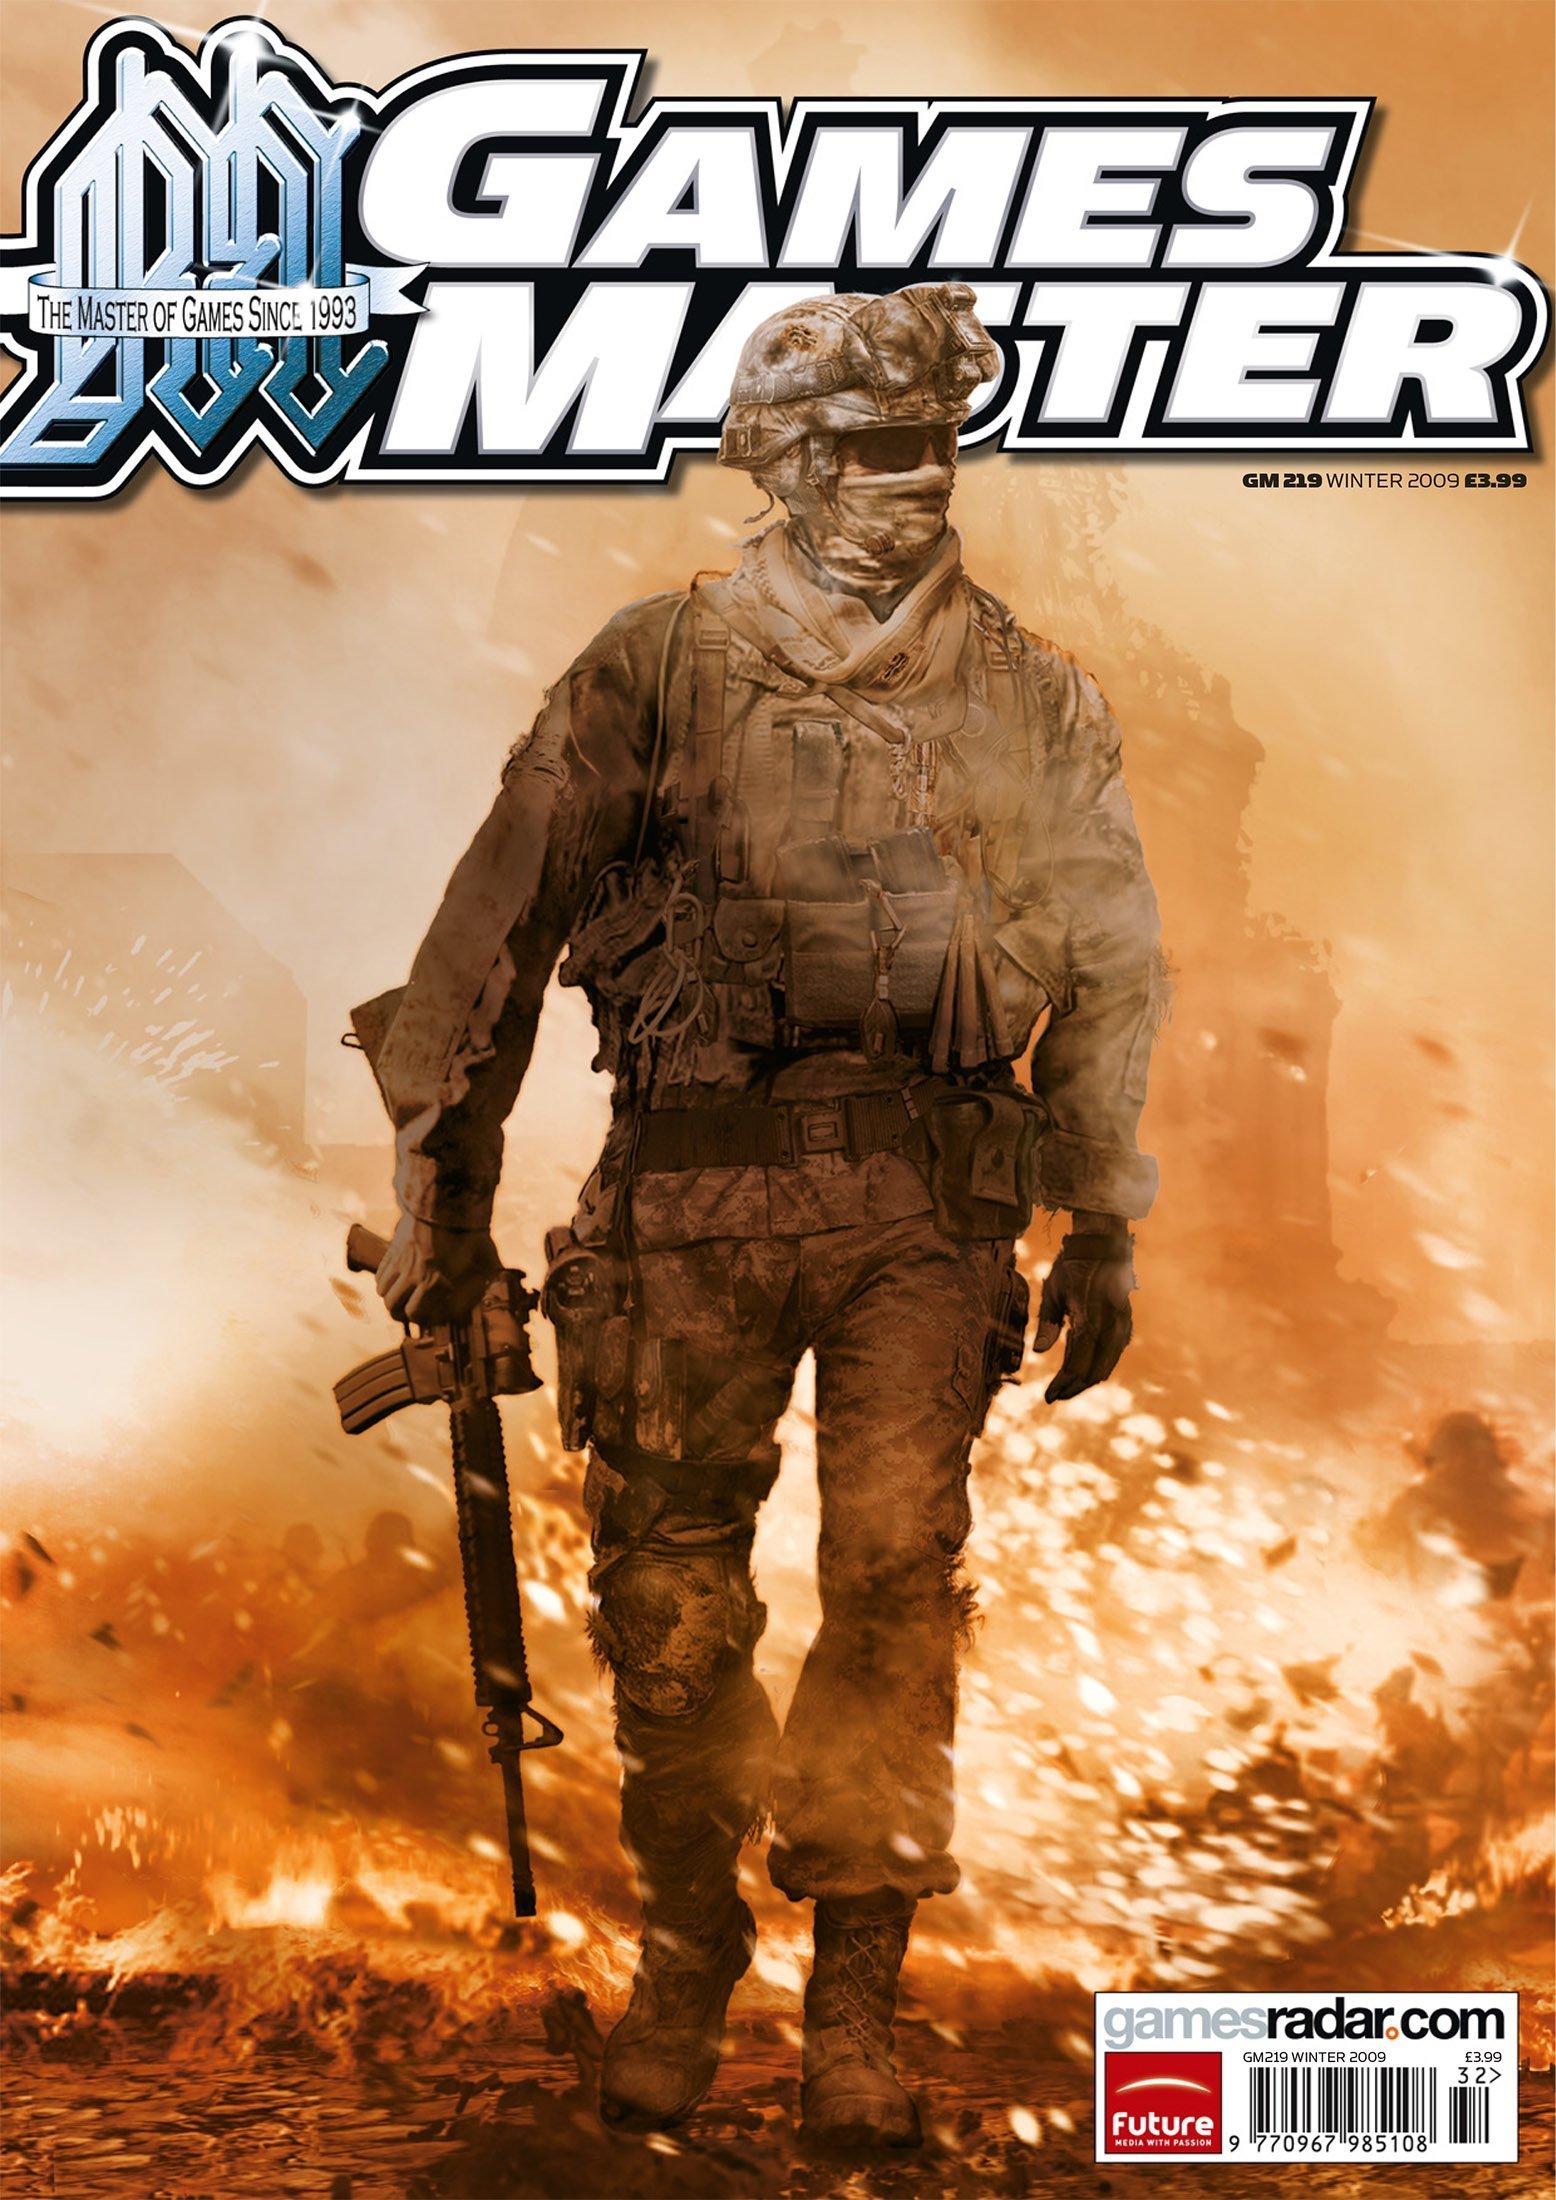 GamesMaster Issue 219 (Winter 2009)